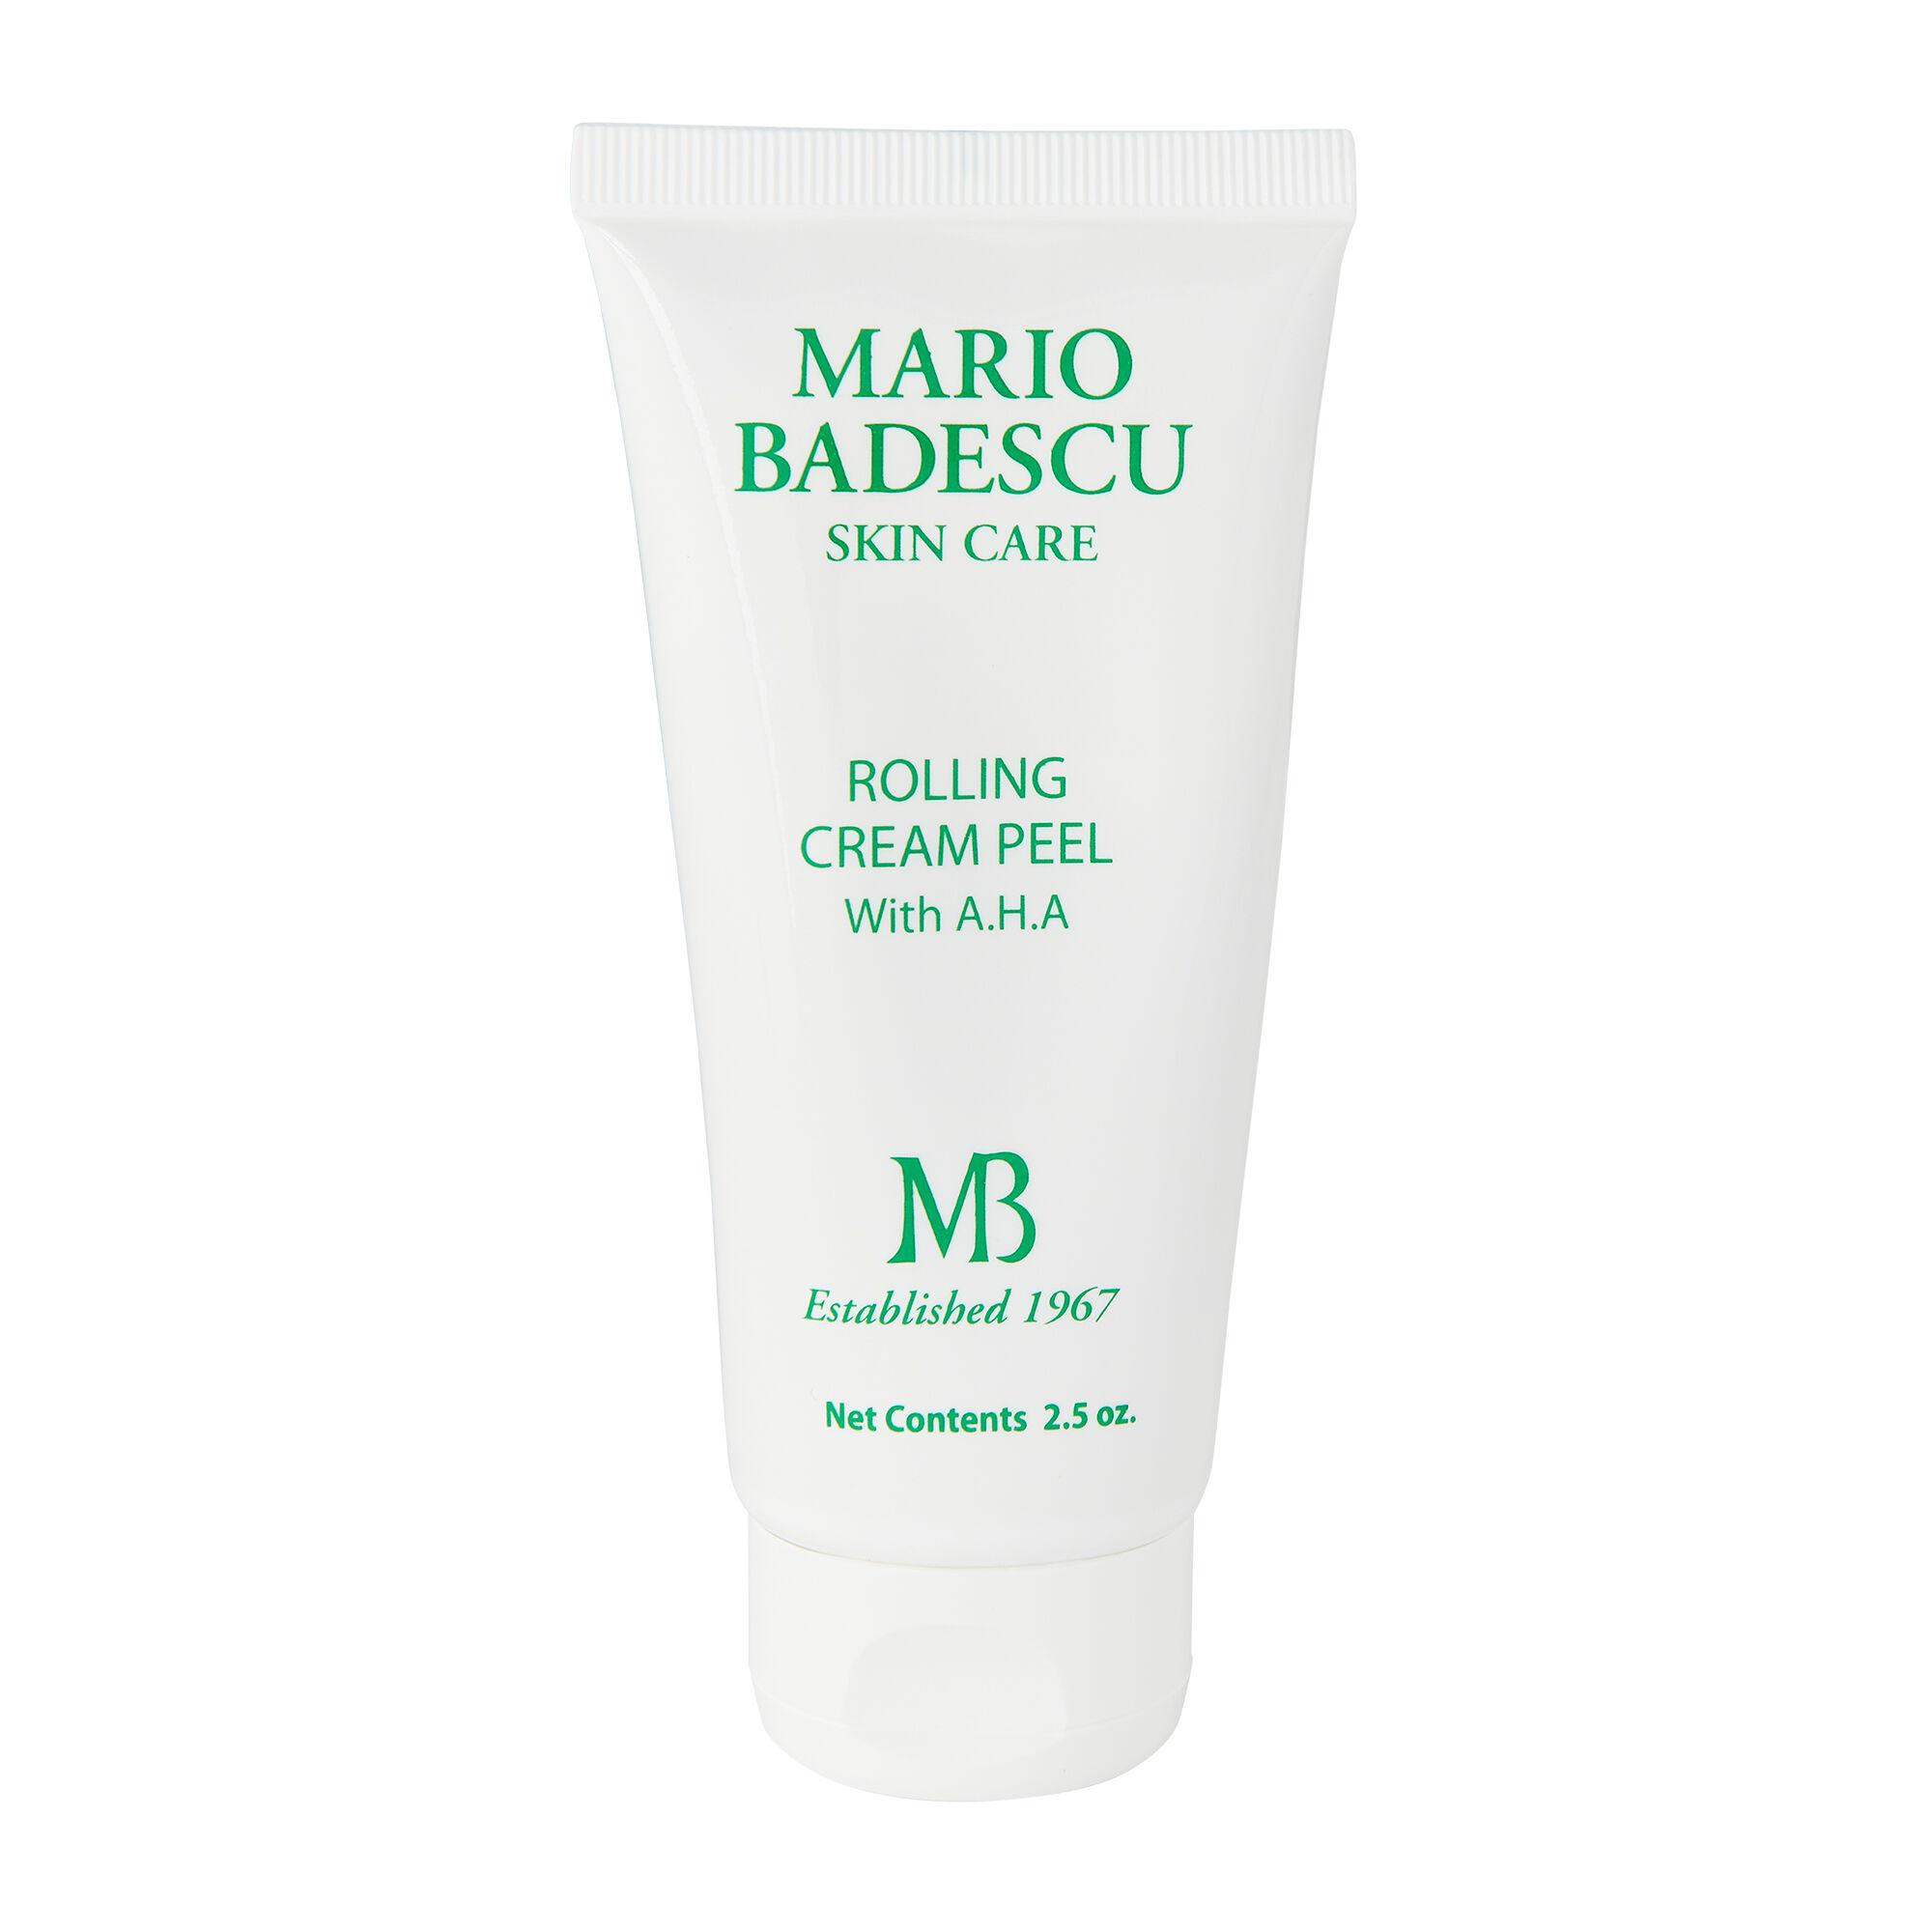 Mario Badescu Rolling Cream Peel With AHA 73ml